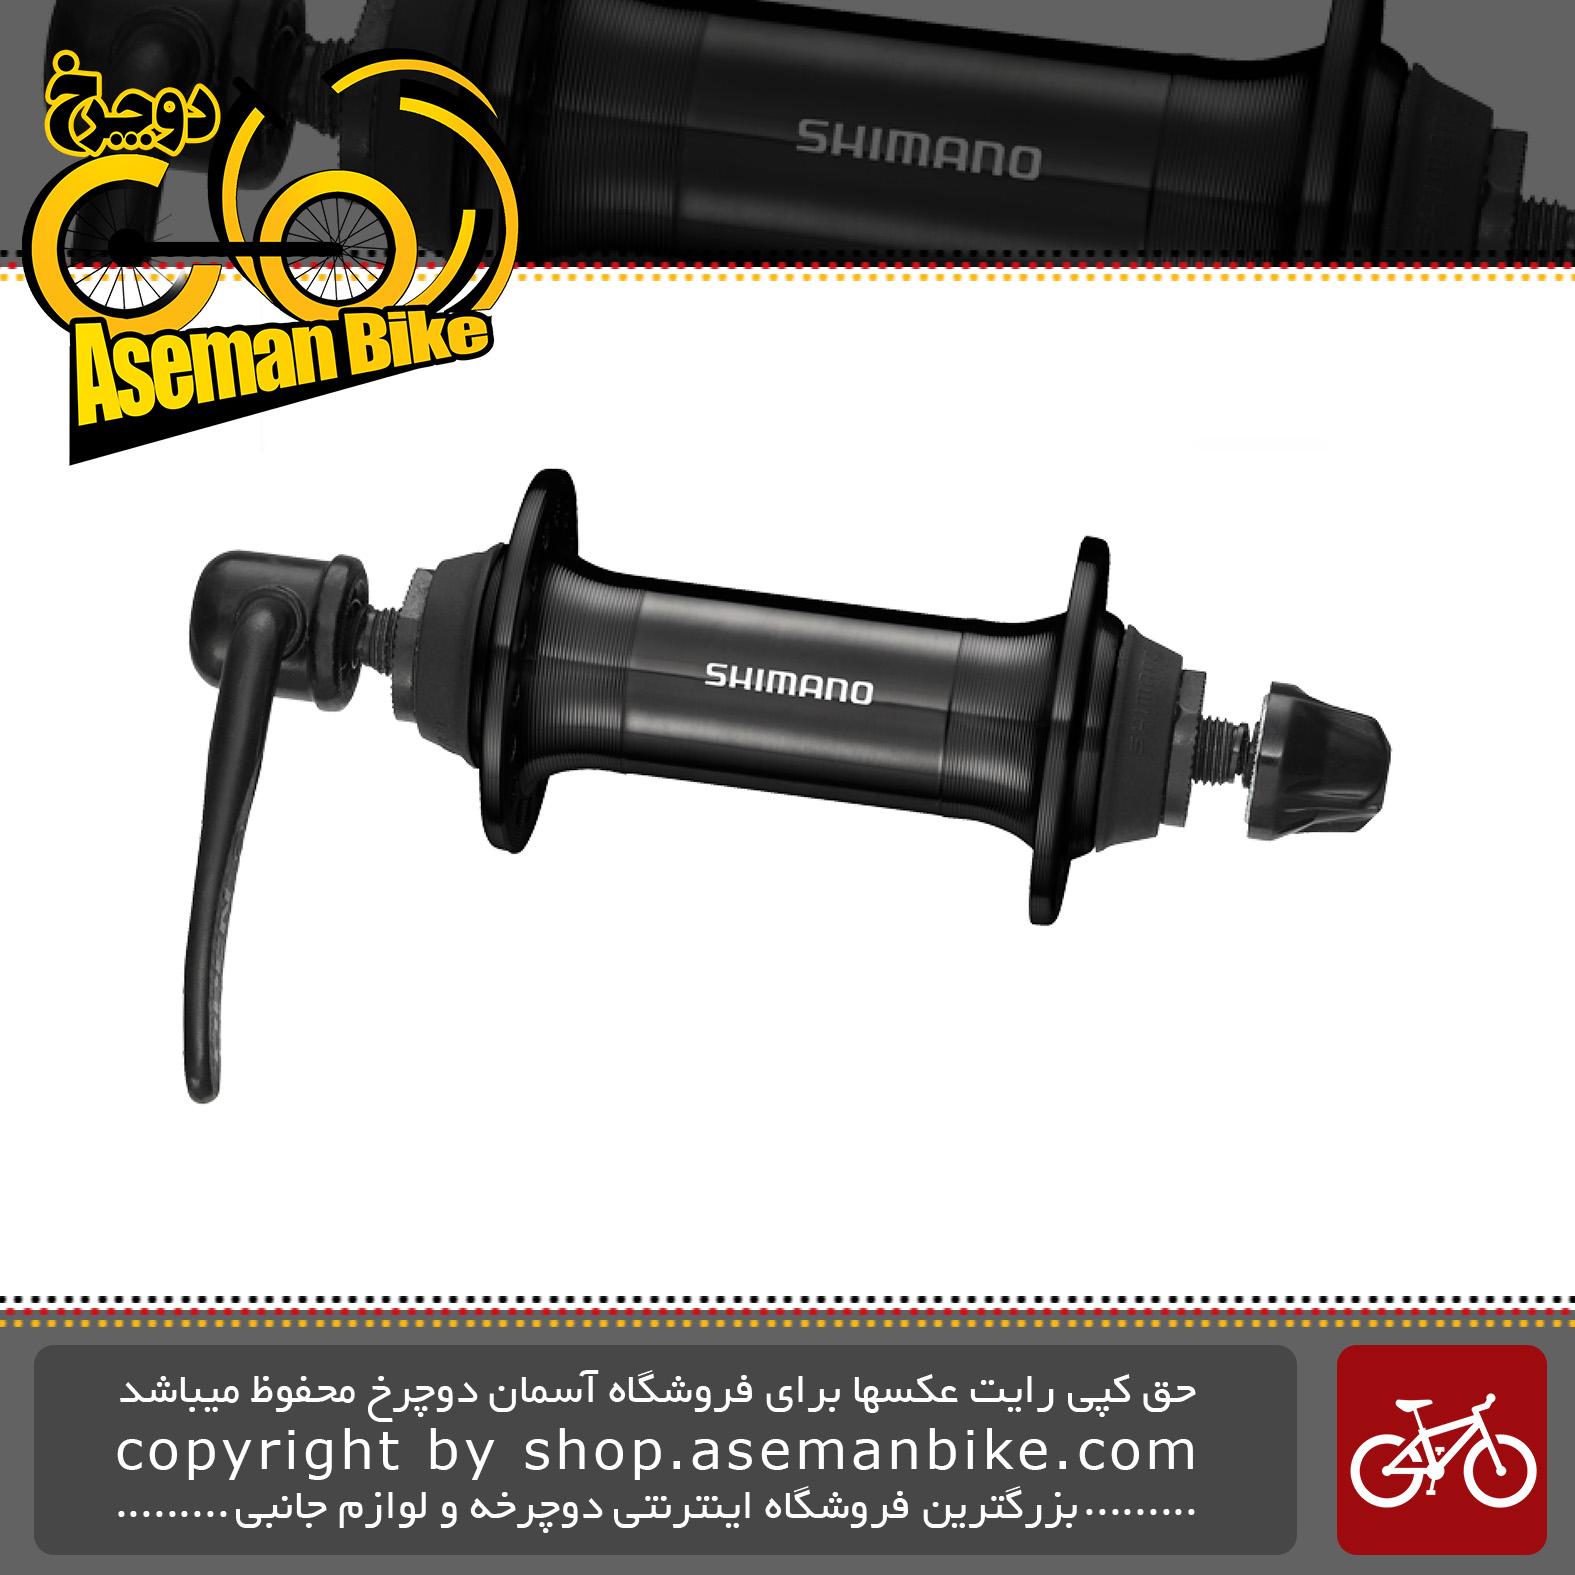 توپی جلو دوچرخه شیمانو آر ام 70 Shimano Hub HB RM 70 Front